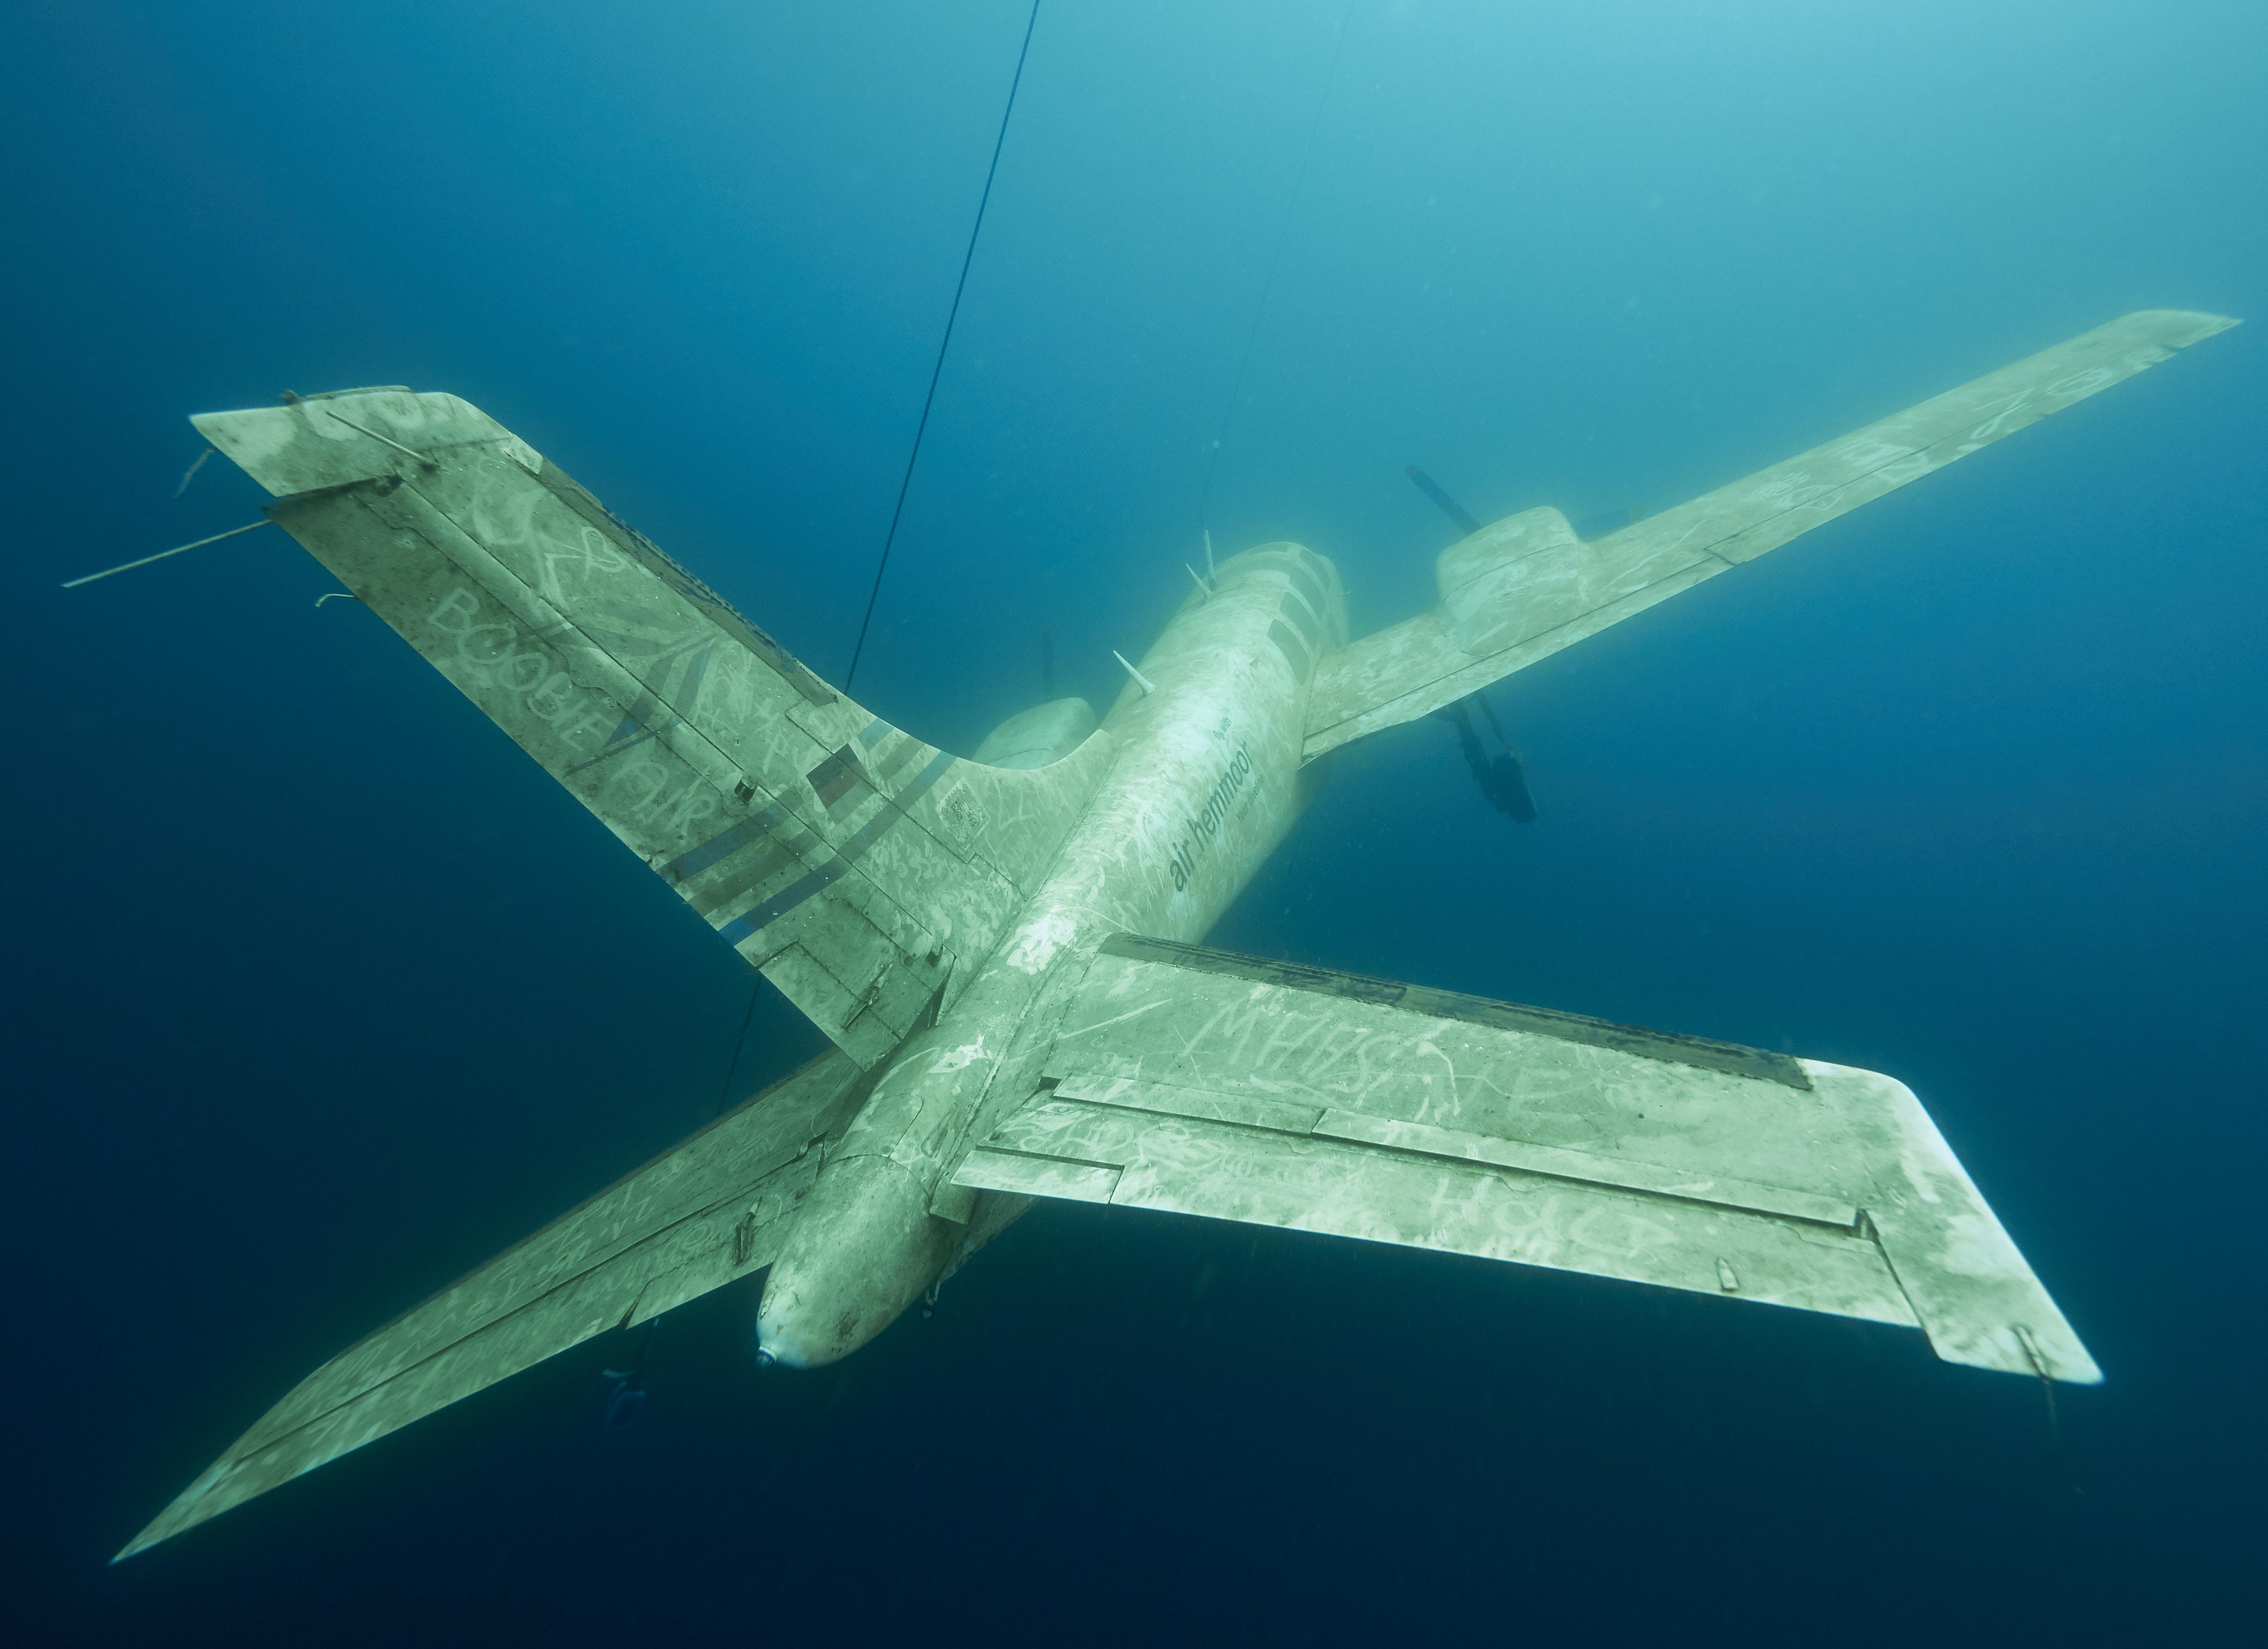 Freediving Kreidesee Hemmoor - Piper Aircraft P601